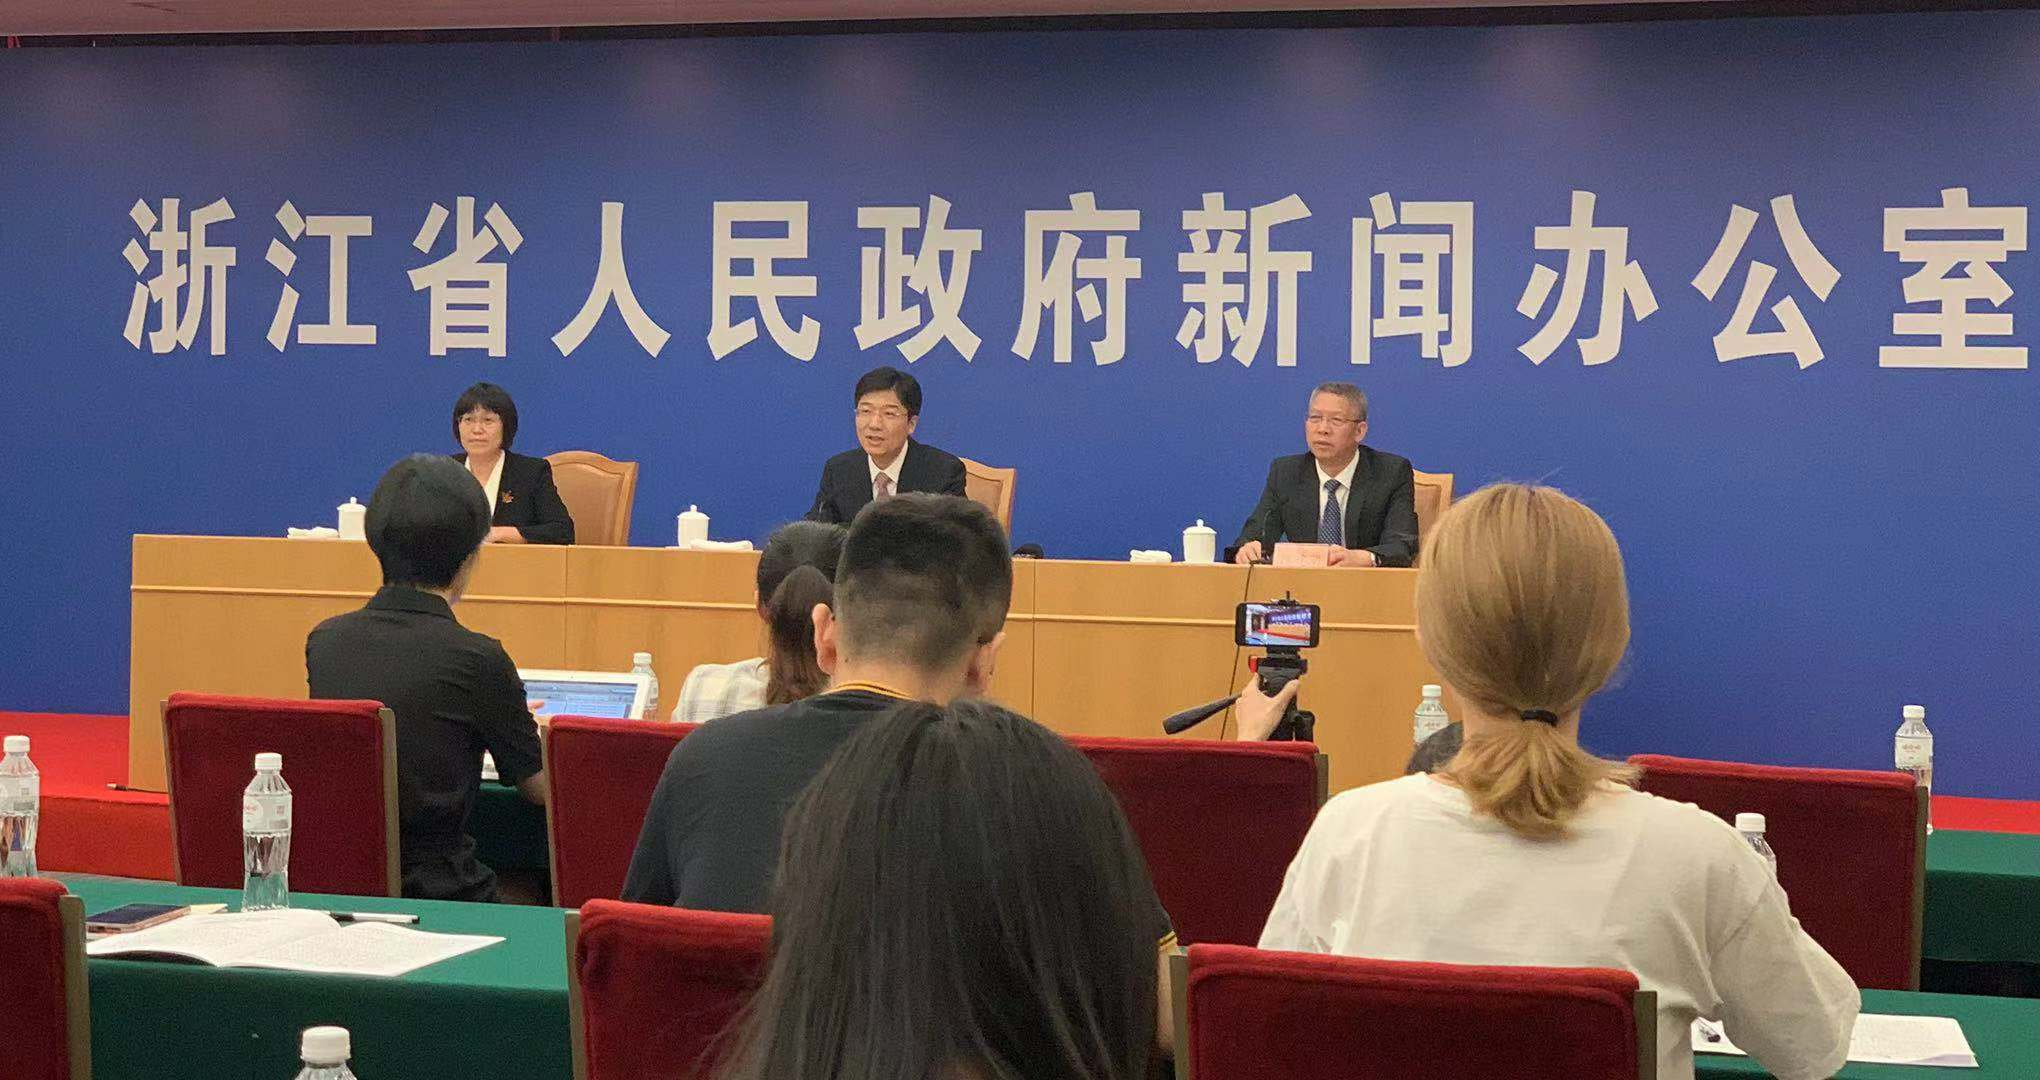 "<b>近250万温州人在外创业,""温州人经济""总量达1.2万亿</b>"